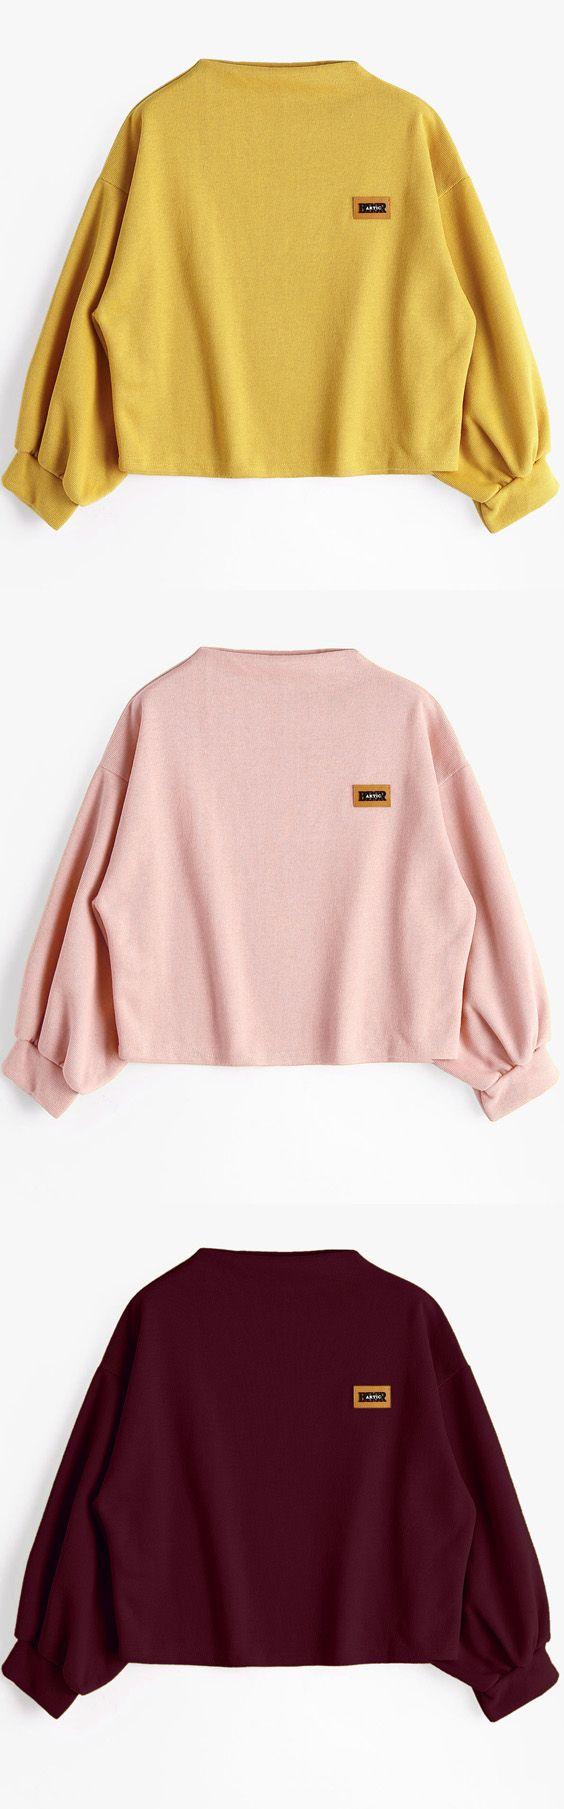 Up to 68% OFF! Badge Patched Lantern Sleeve Sweatshirt. Zaful,zaful.com,zaful fashion,tops,womens tops,outerwear,sweatshirts,hoodies,hoodies outfit,hoodies for teens,sweatshirts outfit,long sleeve tops,sweatshirts for teens,winter outfits,fall outfits,tops,sweatshirts for women,women's hoodies,womens sweatshirts,cute sweatshirts,floral hoodie,crop hoodies,oversized sweatshirt, halloween costumes,halloween,halloween outfits,halloween tops,halloween costume ideas. @zaful Extra 10% OFF…